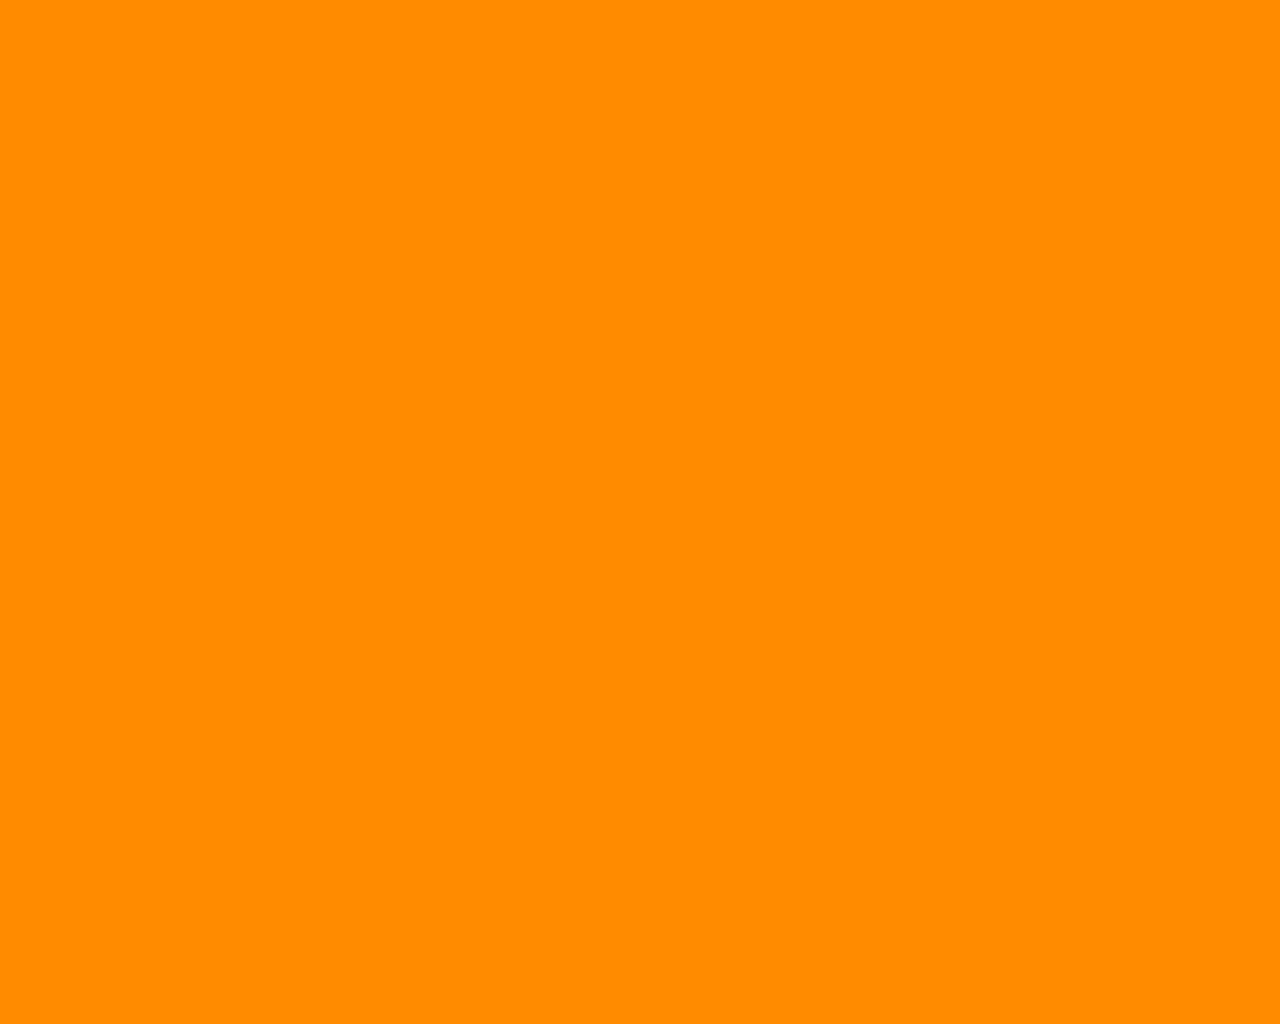 Pin Dark Orange Colour 1280x1024